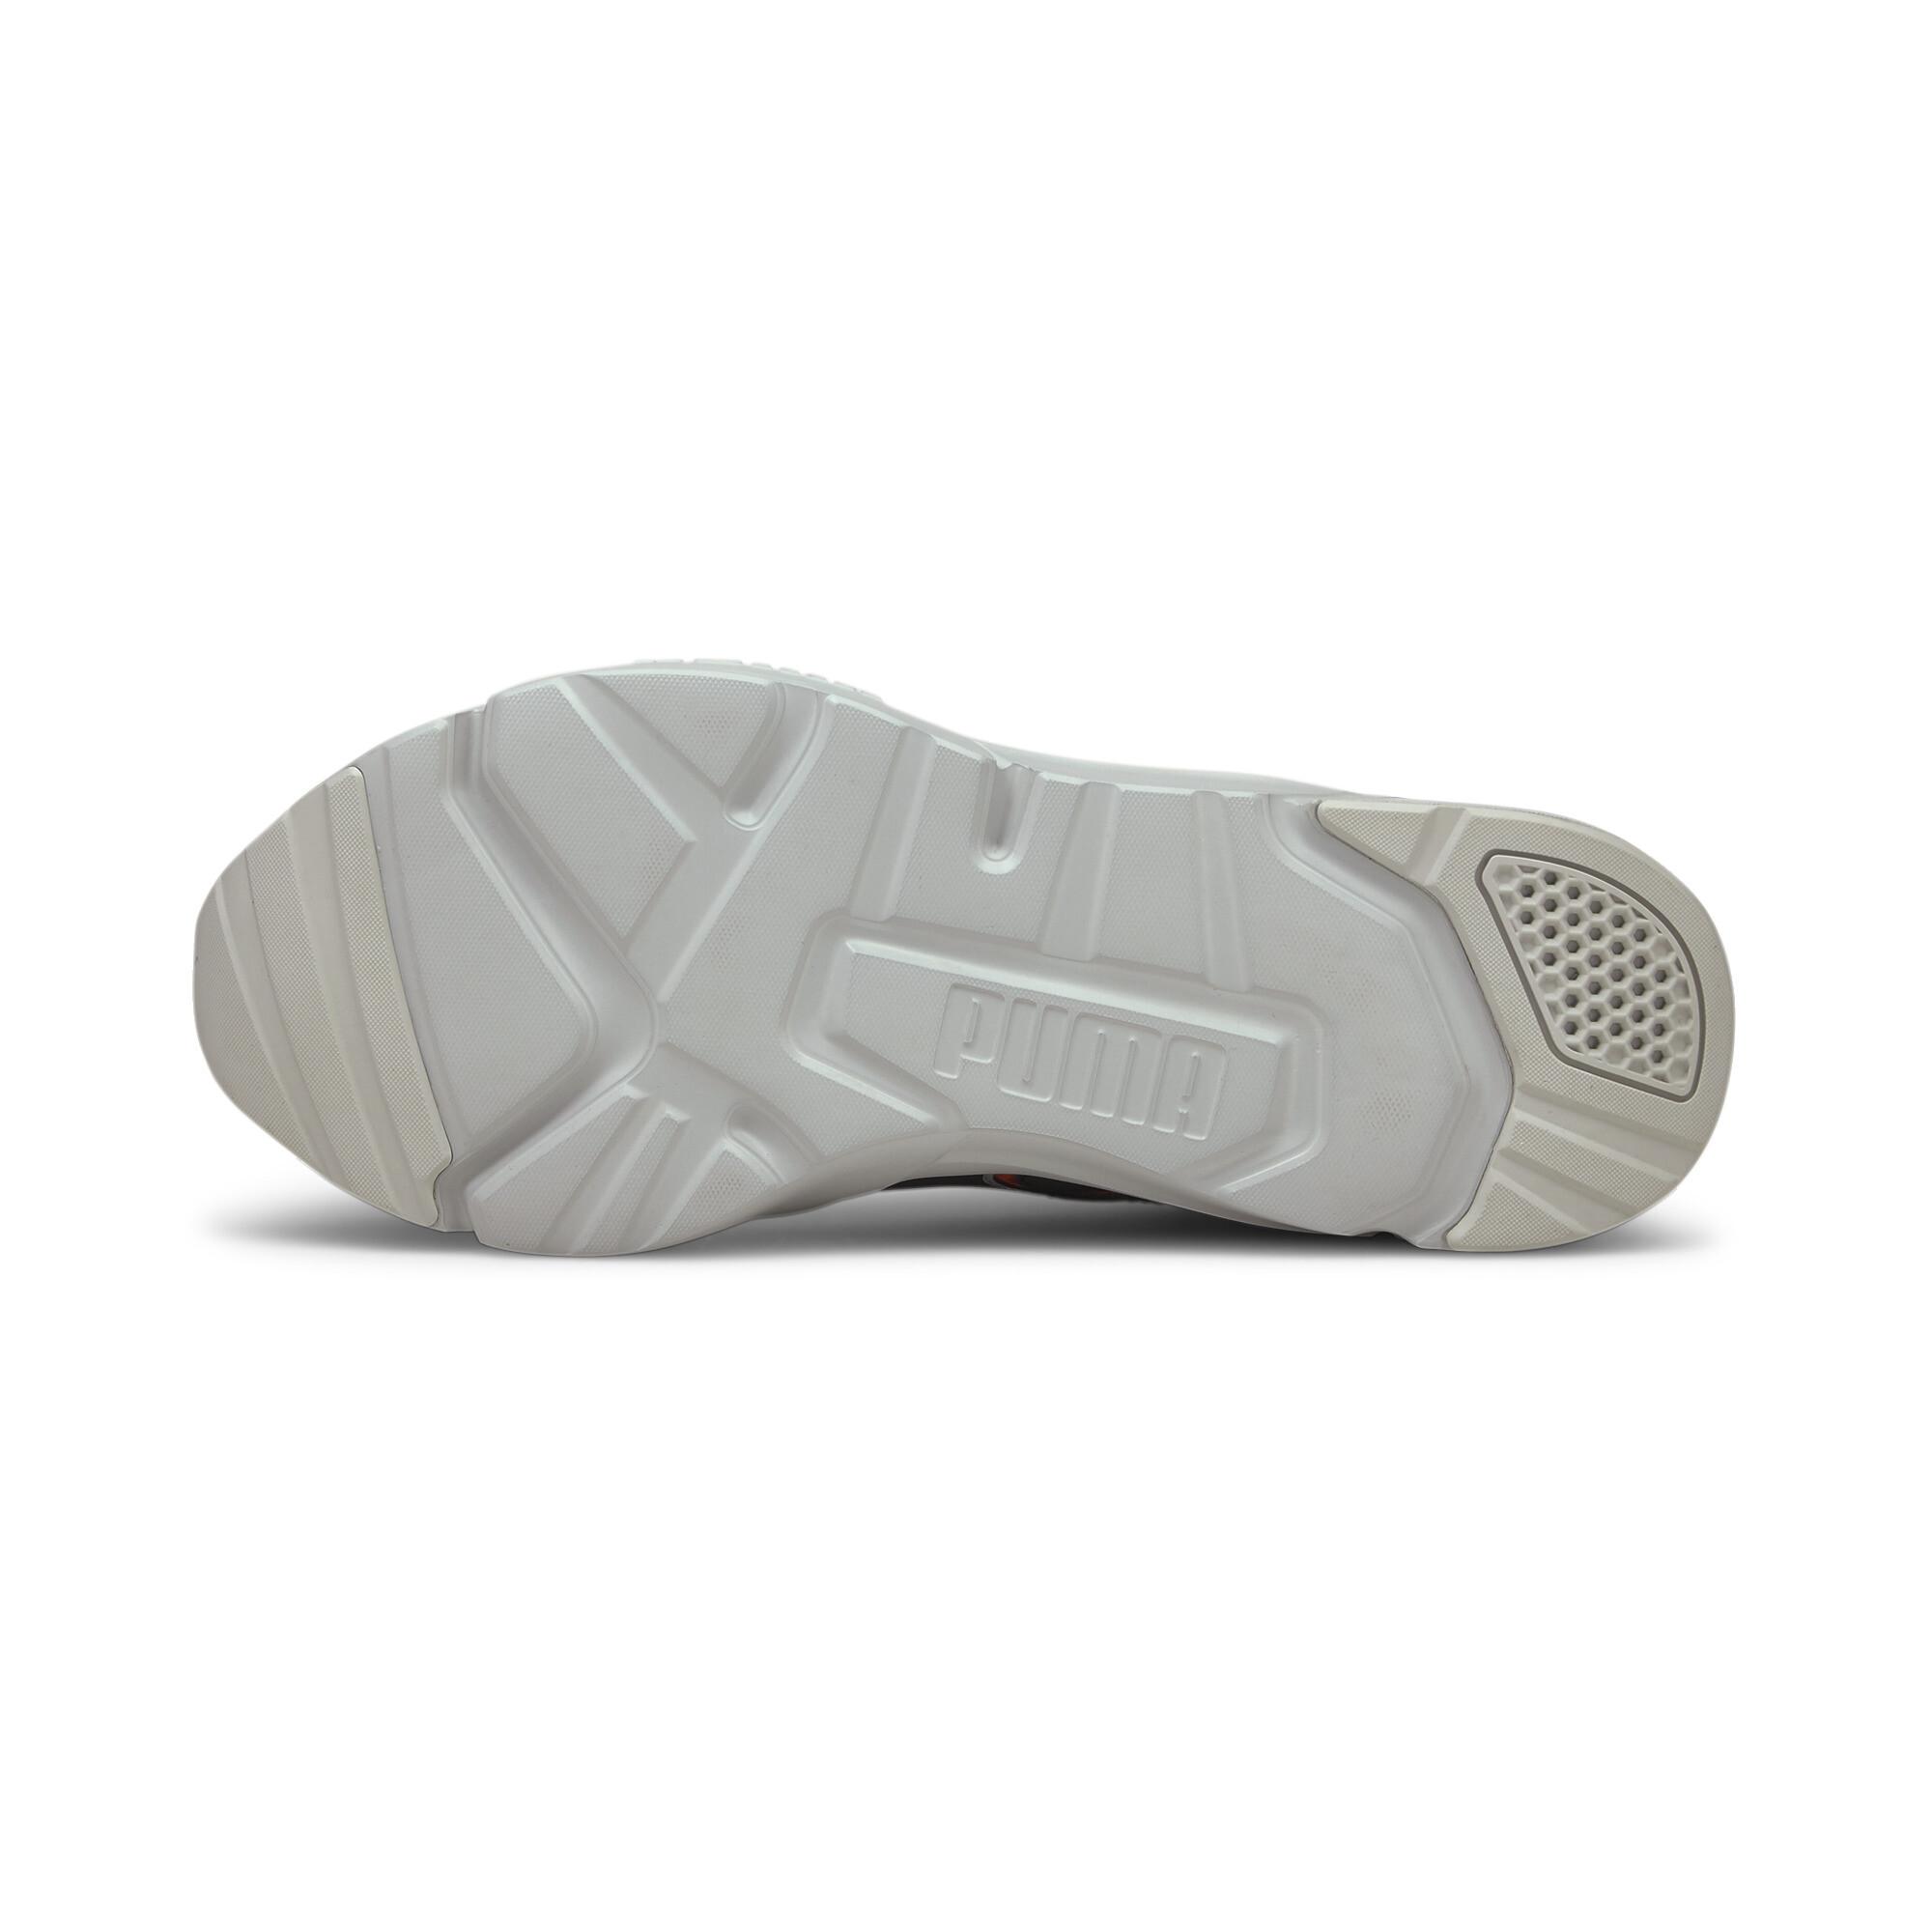 thumbnail 20 - PUMA Men's CELL Pharos Training Shoes